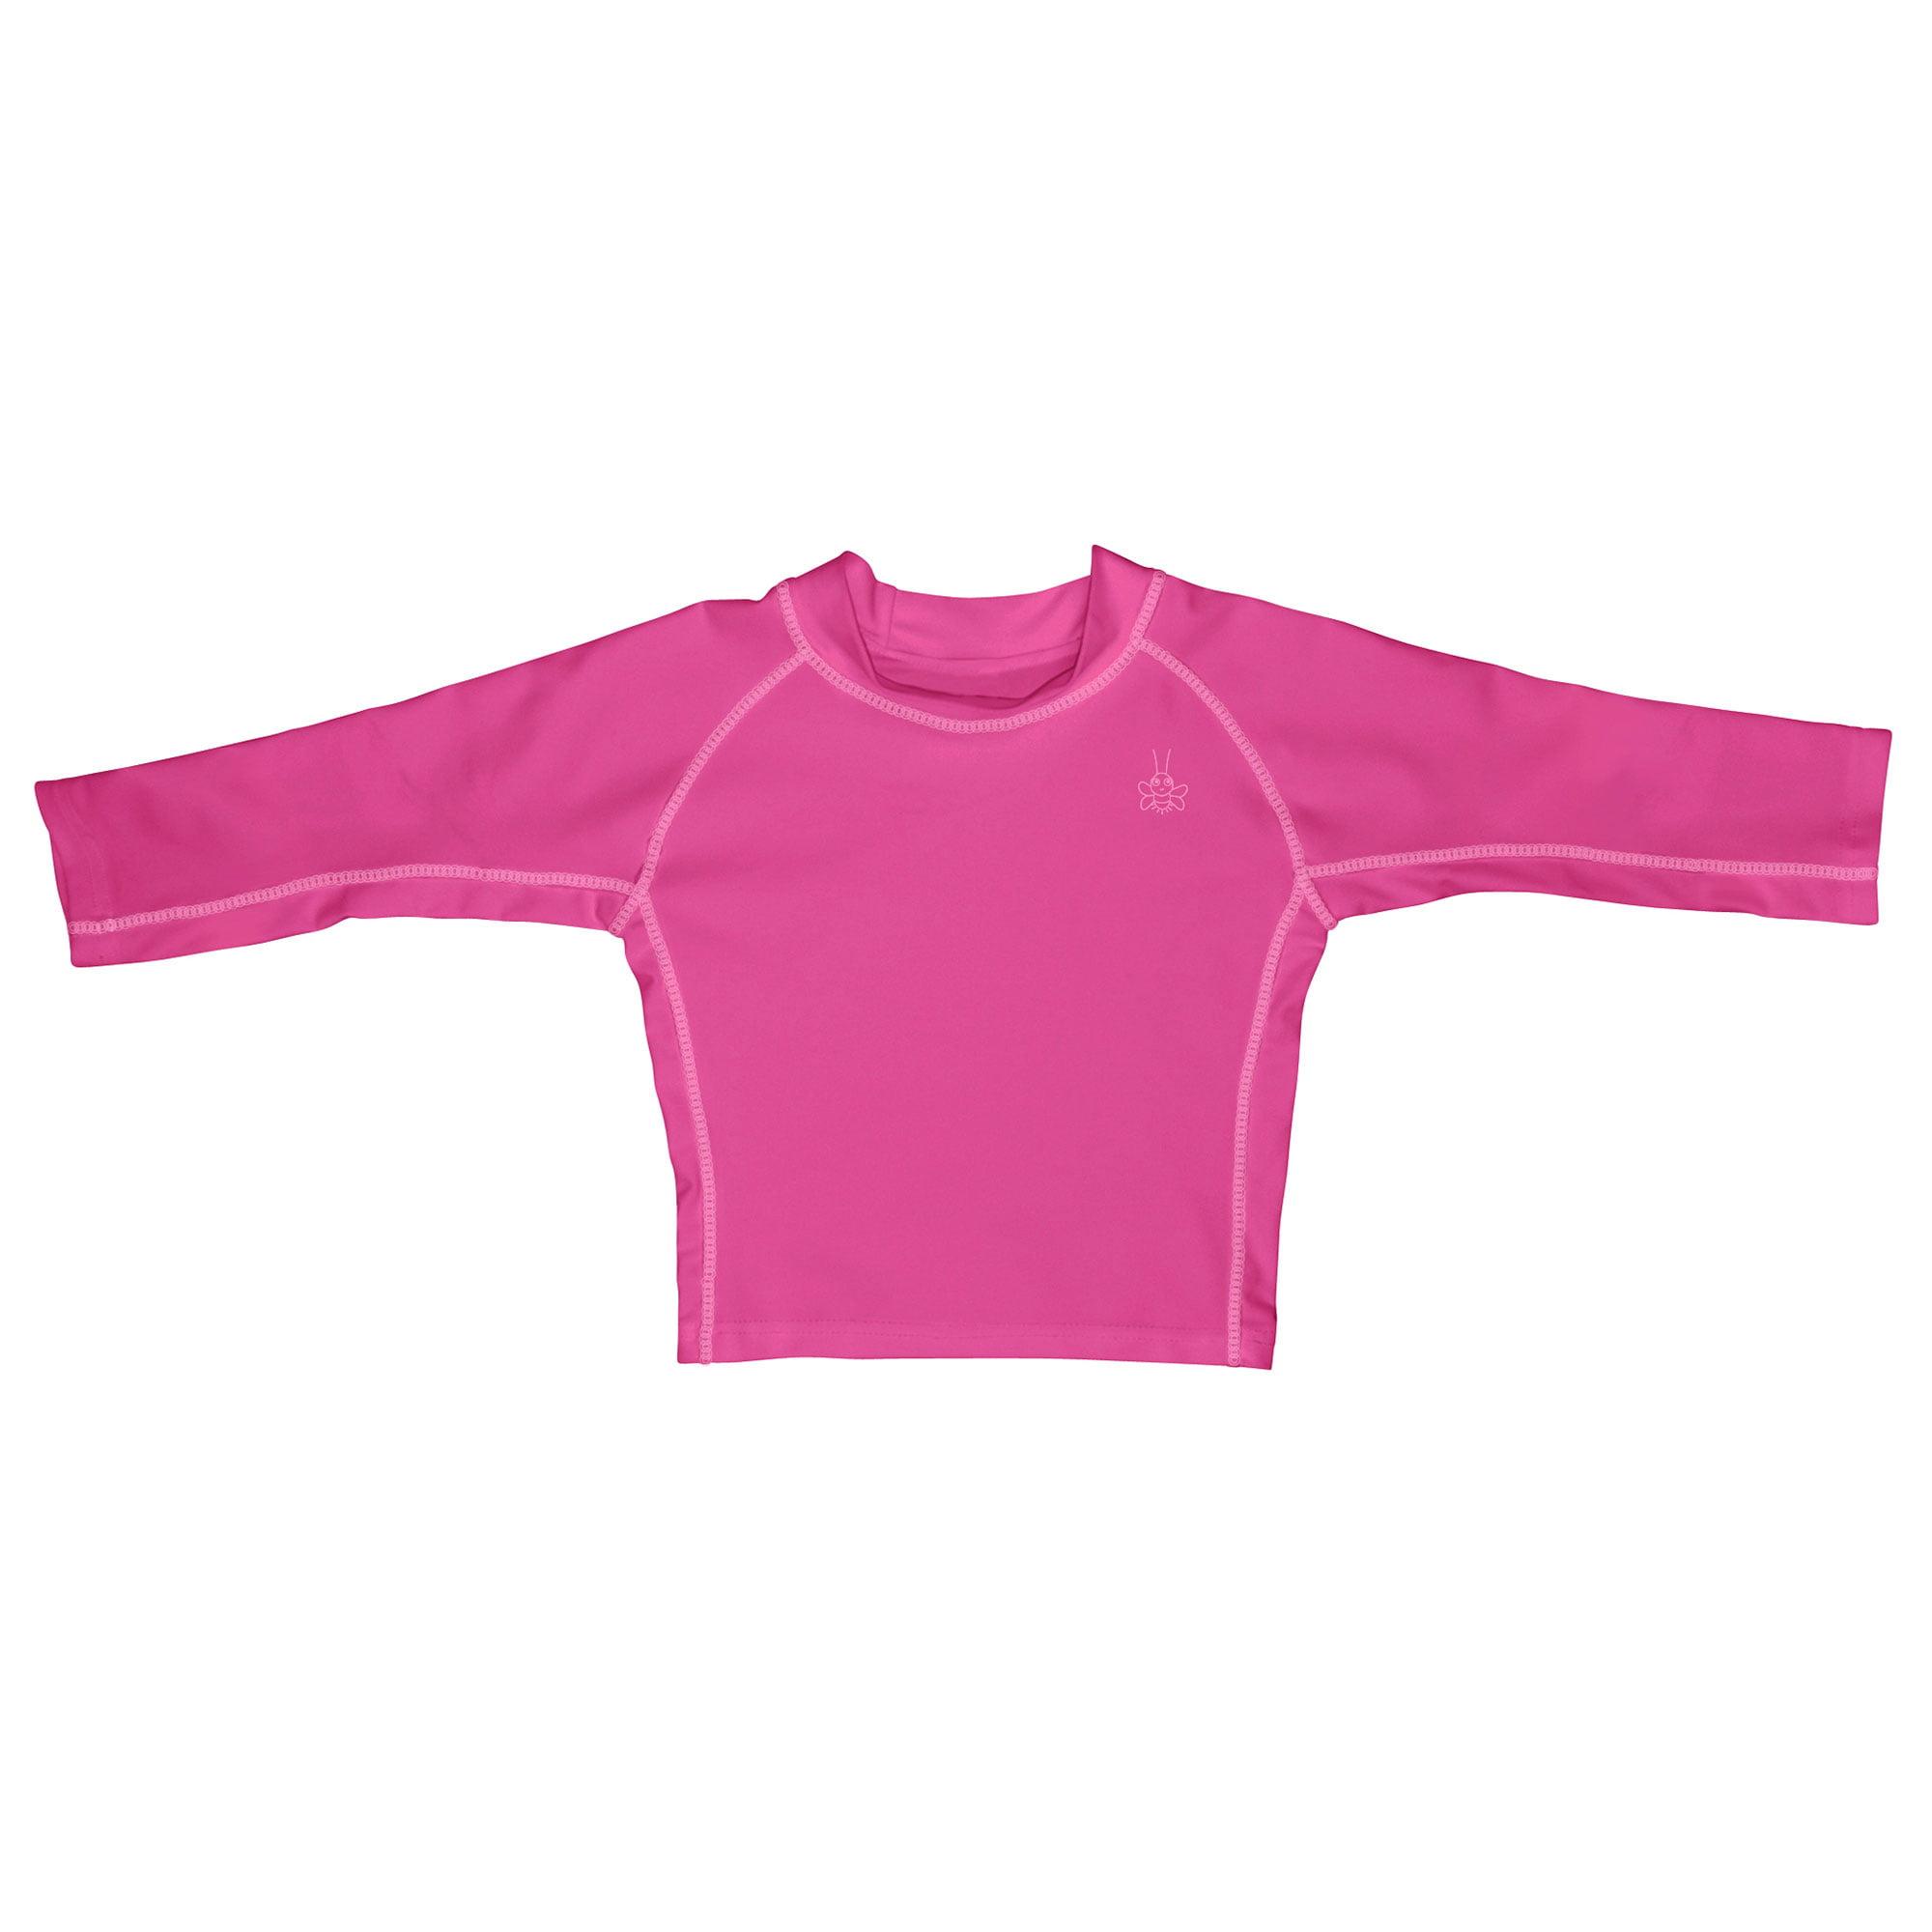 Iplay Long Sleeve Rashguard Top, Swim Shirt or Sun Shirt for Best Sun Protection Rash Guard UPF 50+ Solid Color T-Shirt... by